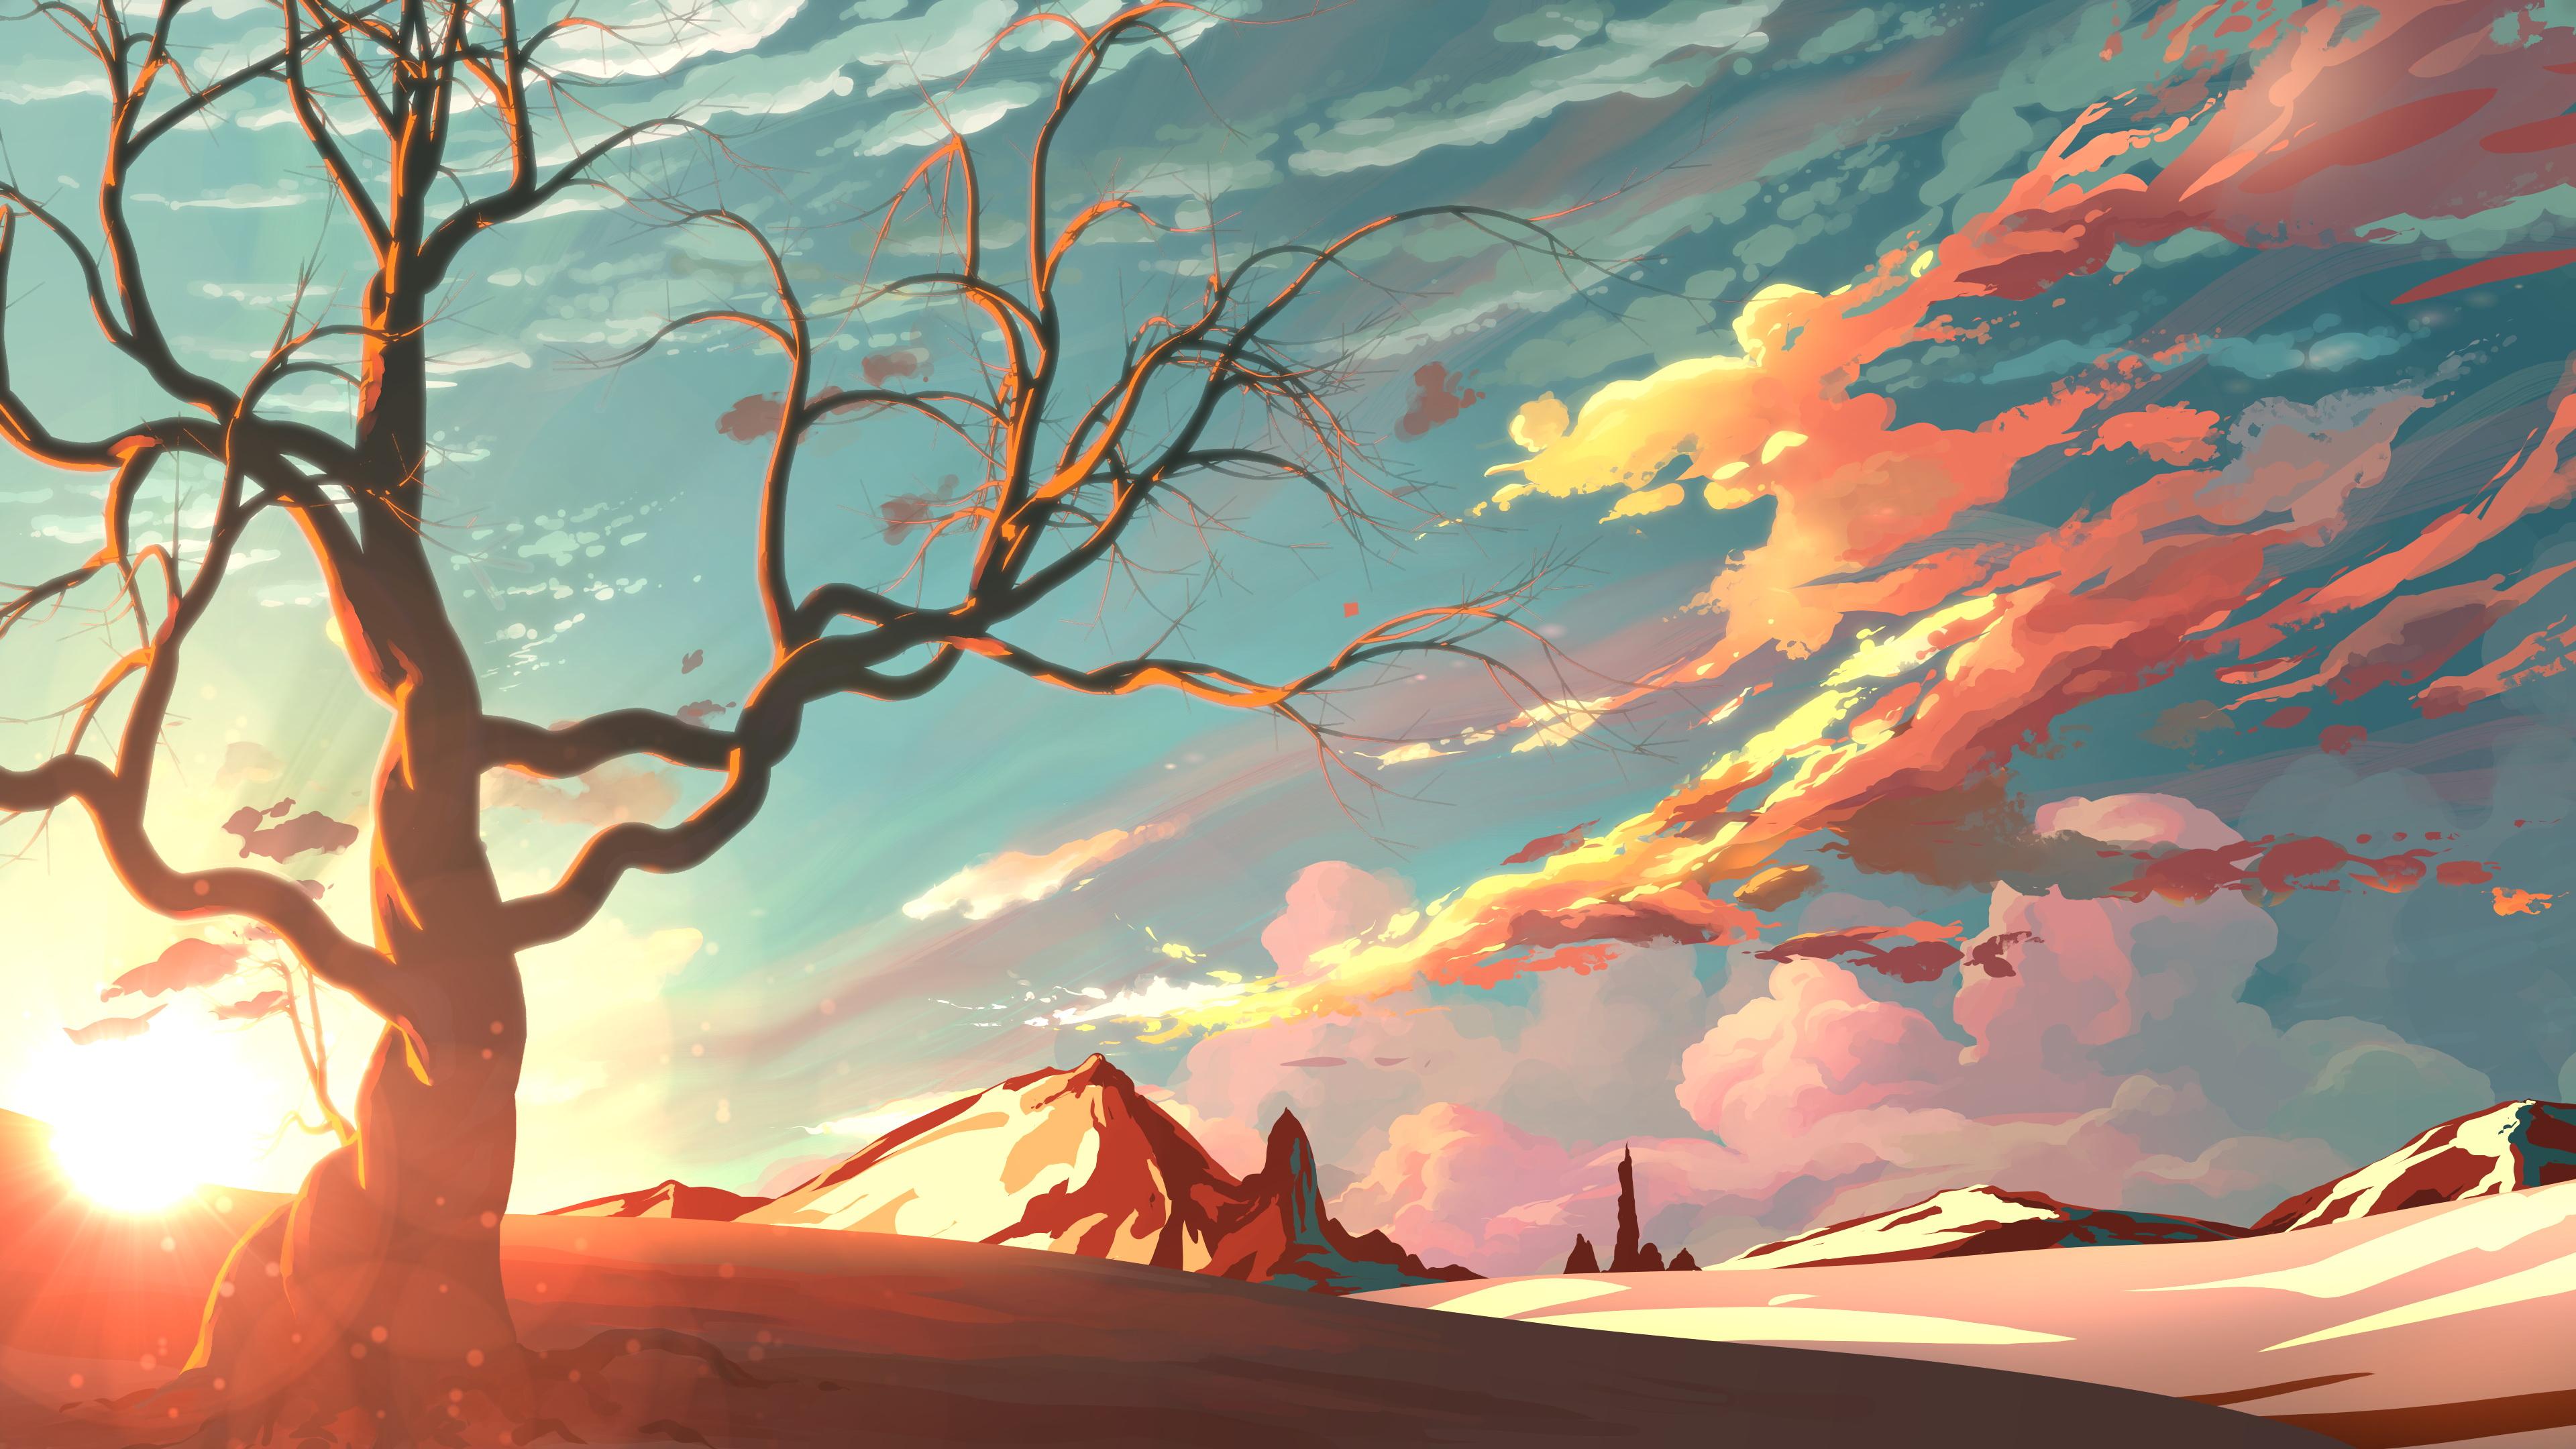 Wallpaper 4k Red Sky Mountains Trees Digital Art Painting 4k